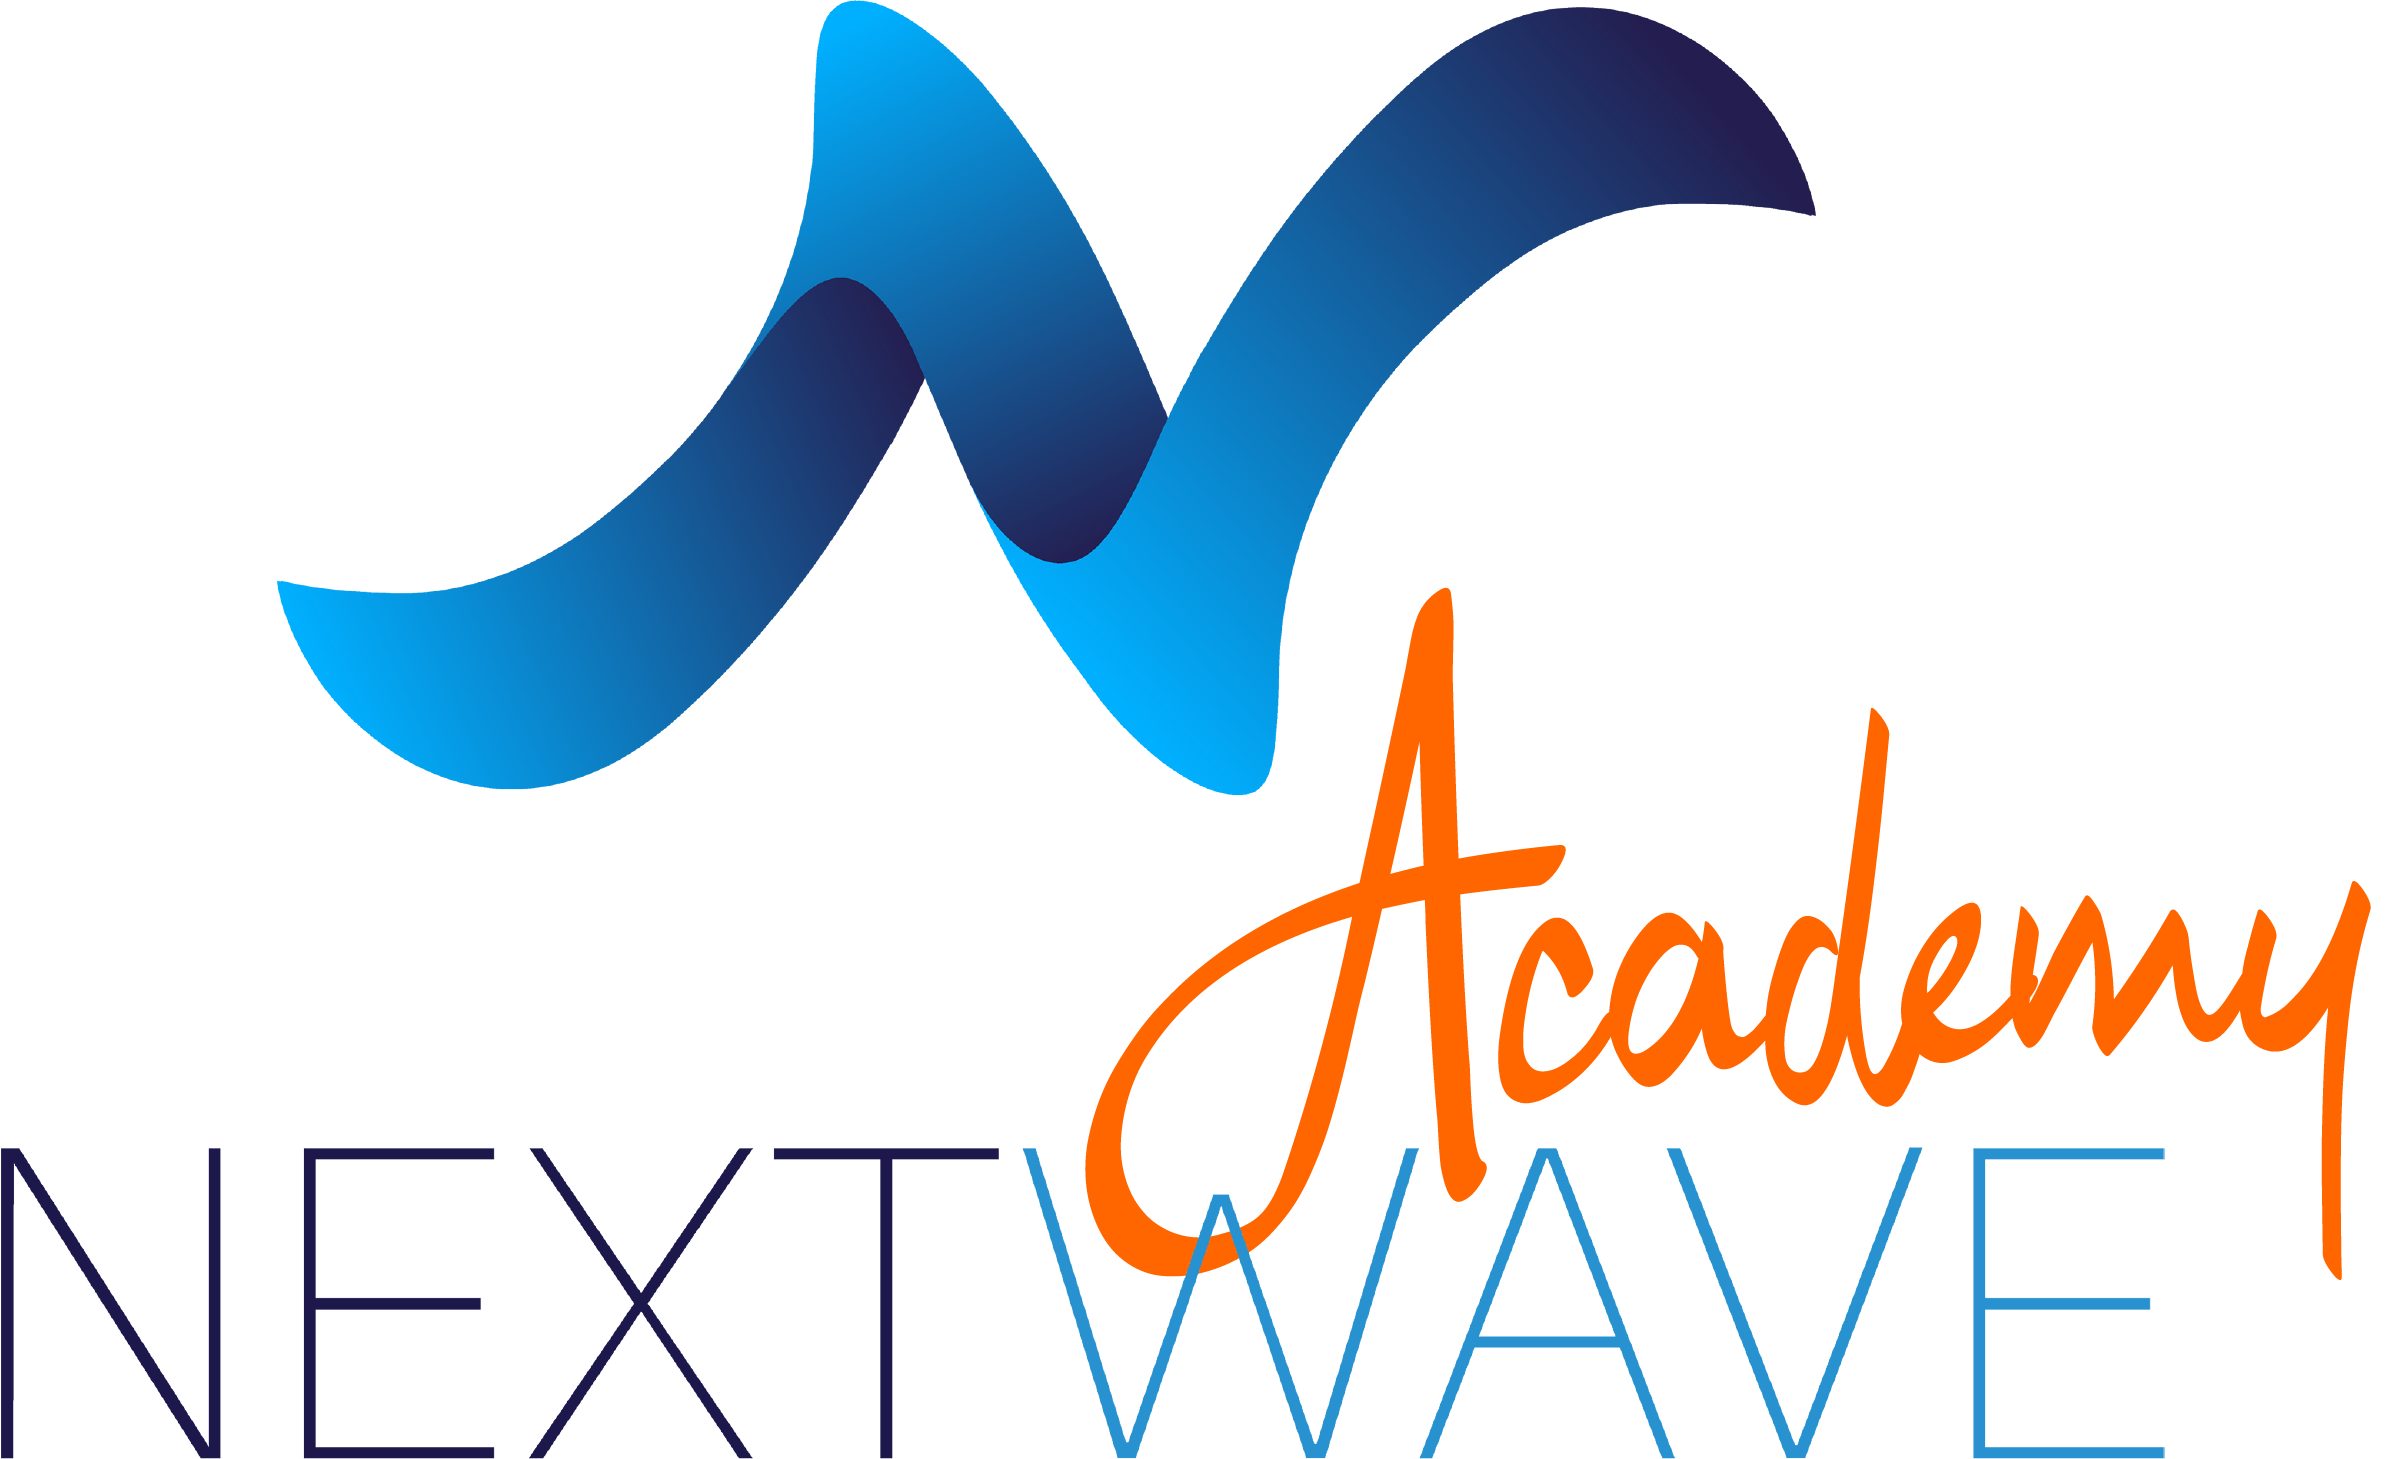 https://nextwaveacademy.gr/wp-content/uploads/2020/09/Academy-wide.png